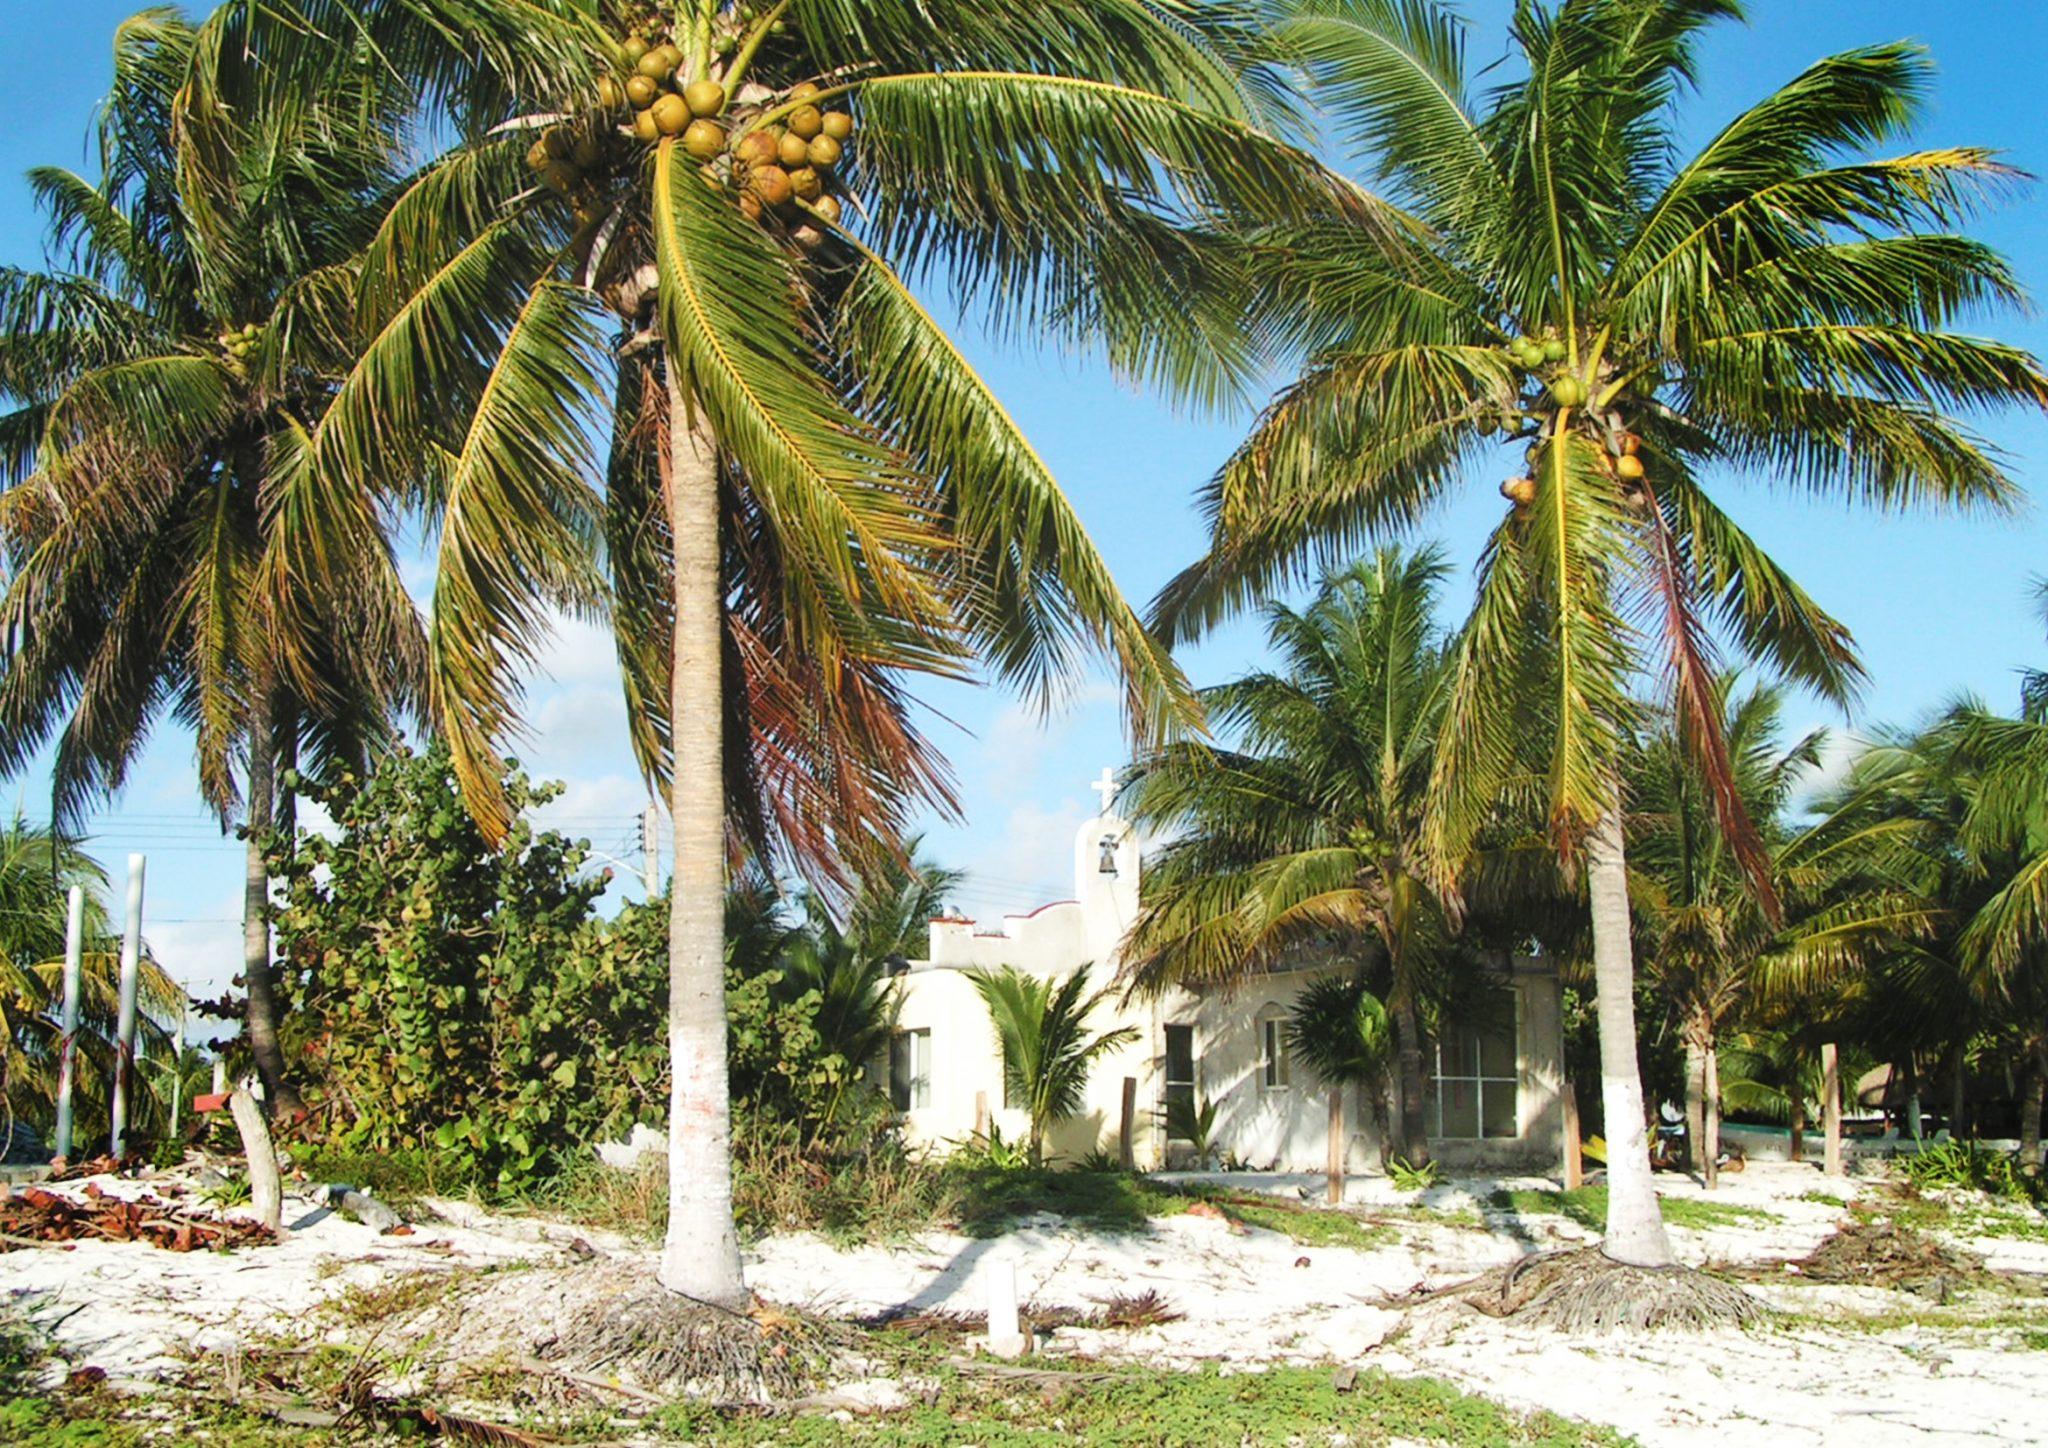 Punta Allen7 - Meksyk - Jukatan informacje ogólne